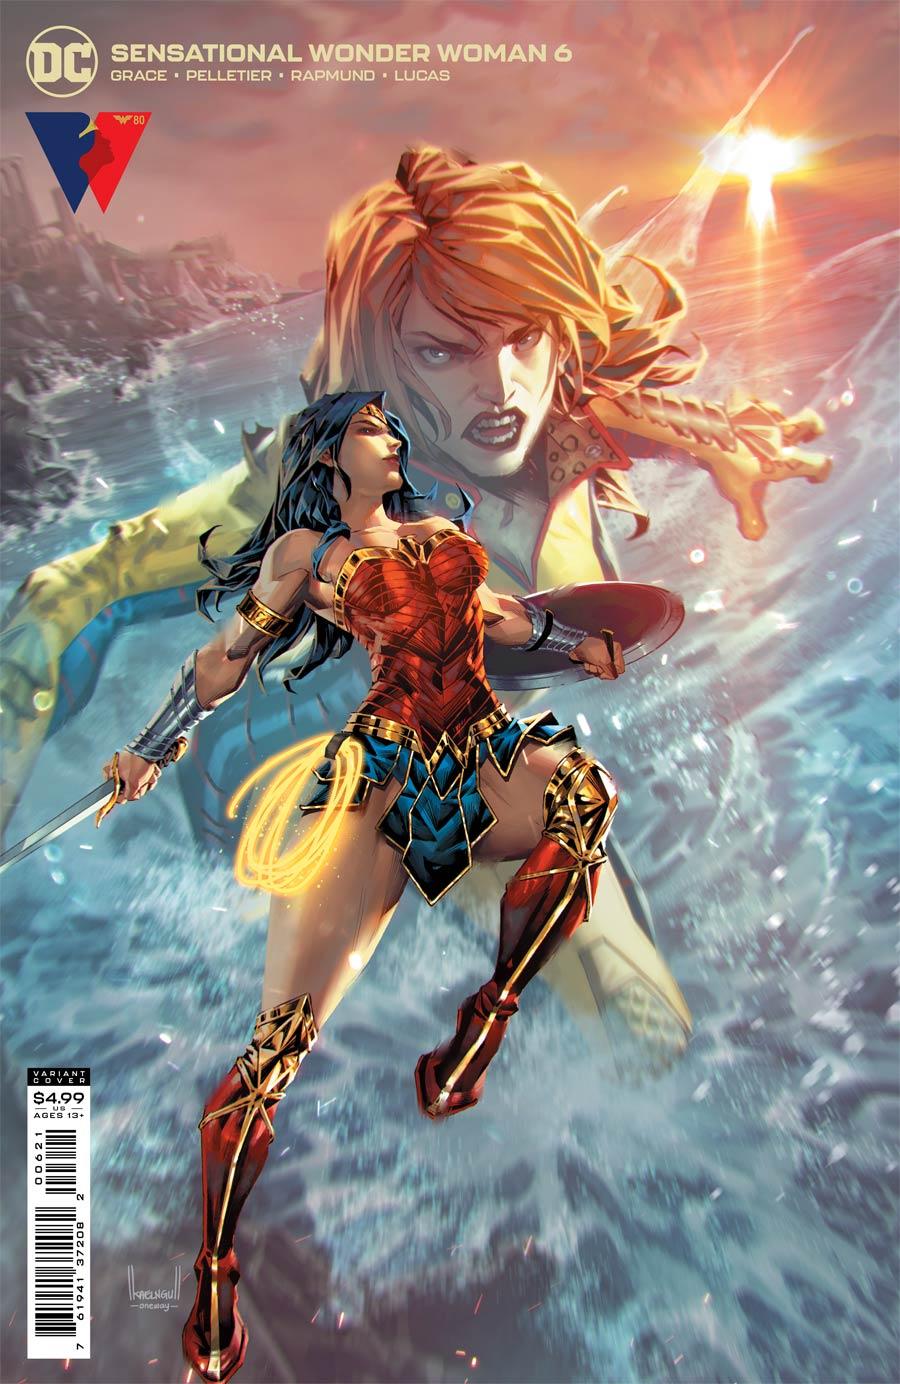 Sensational Wonder Woman #6 Cover B Variant Kael Ngu Card Stock Cover